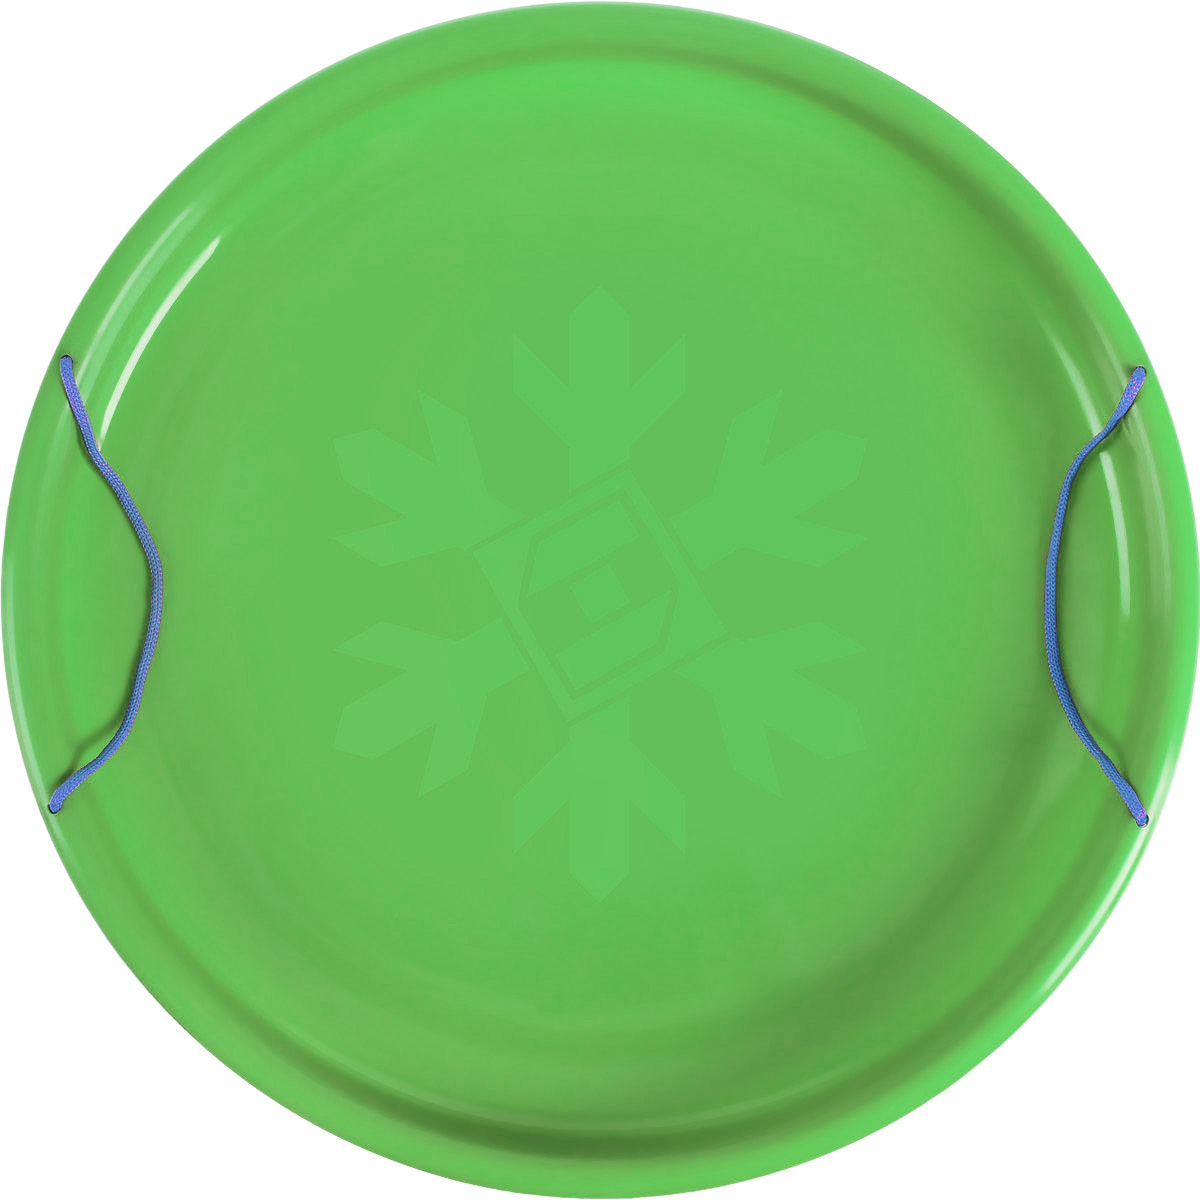 "Санки-ледянки Престиж ""Экстрим"", цвет: зеленый, диаметр 53 см"